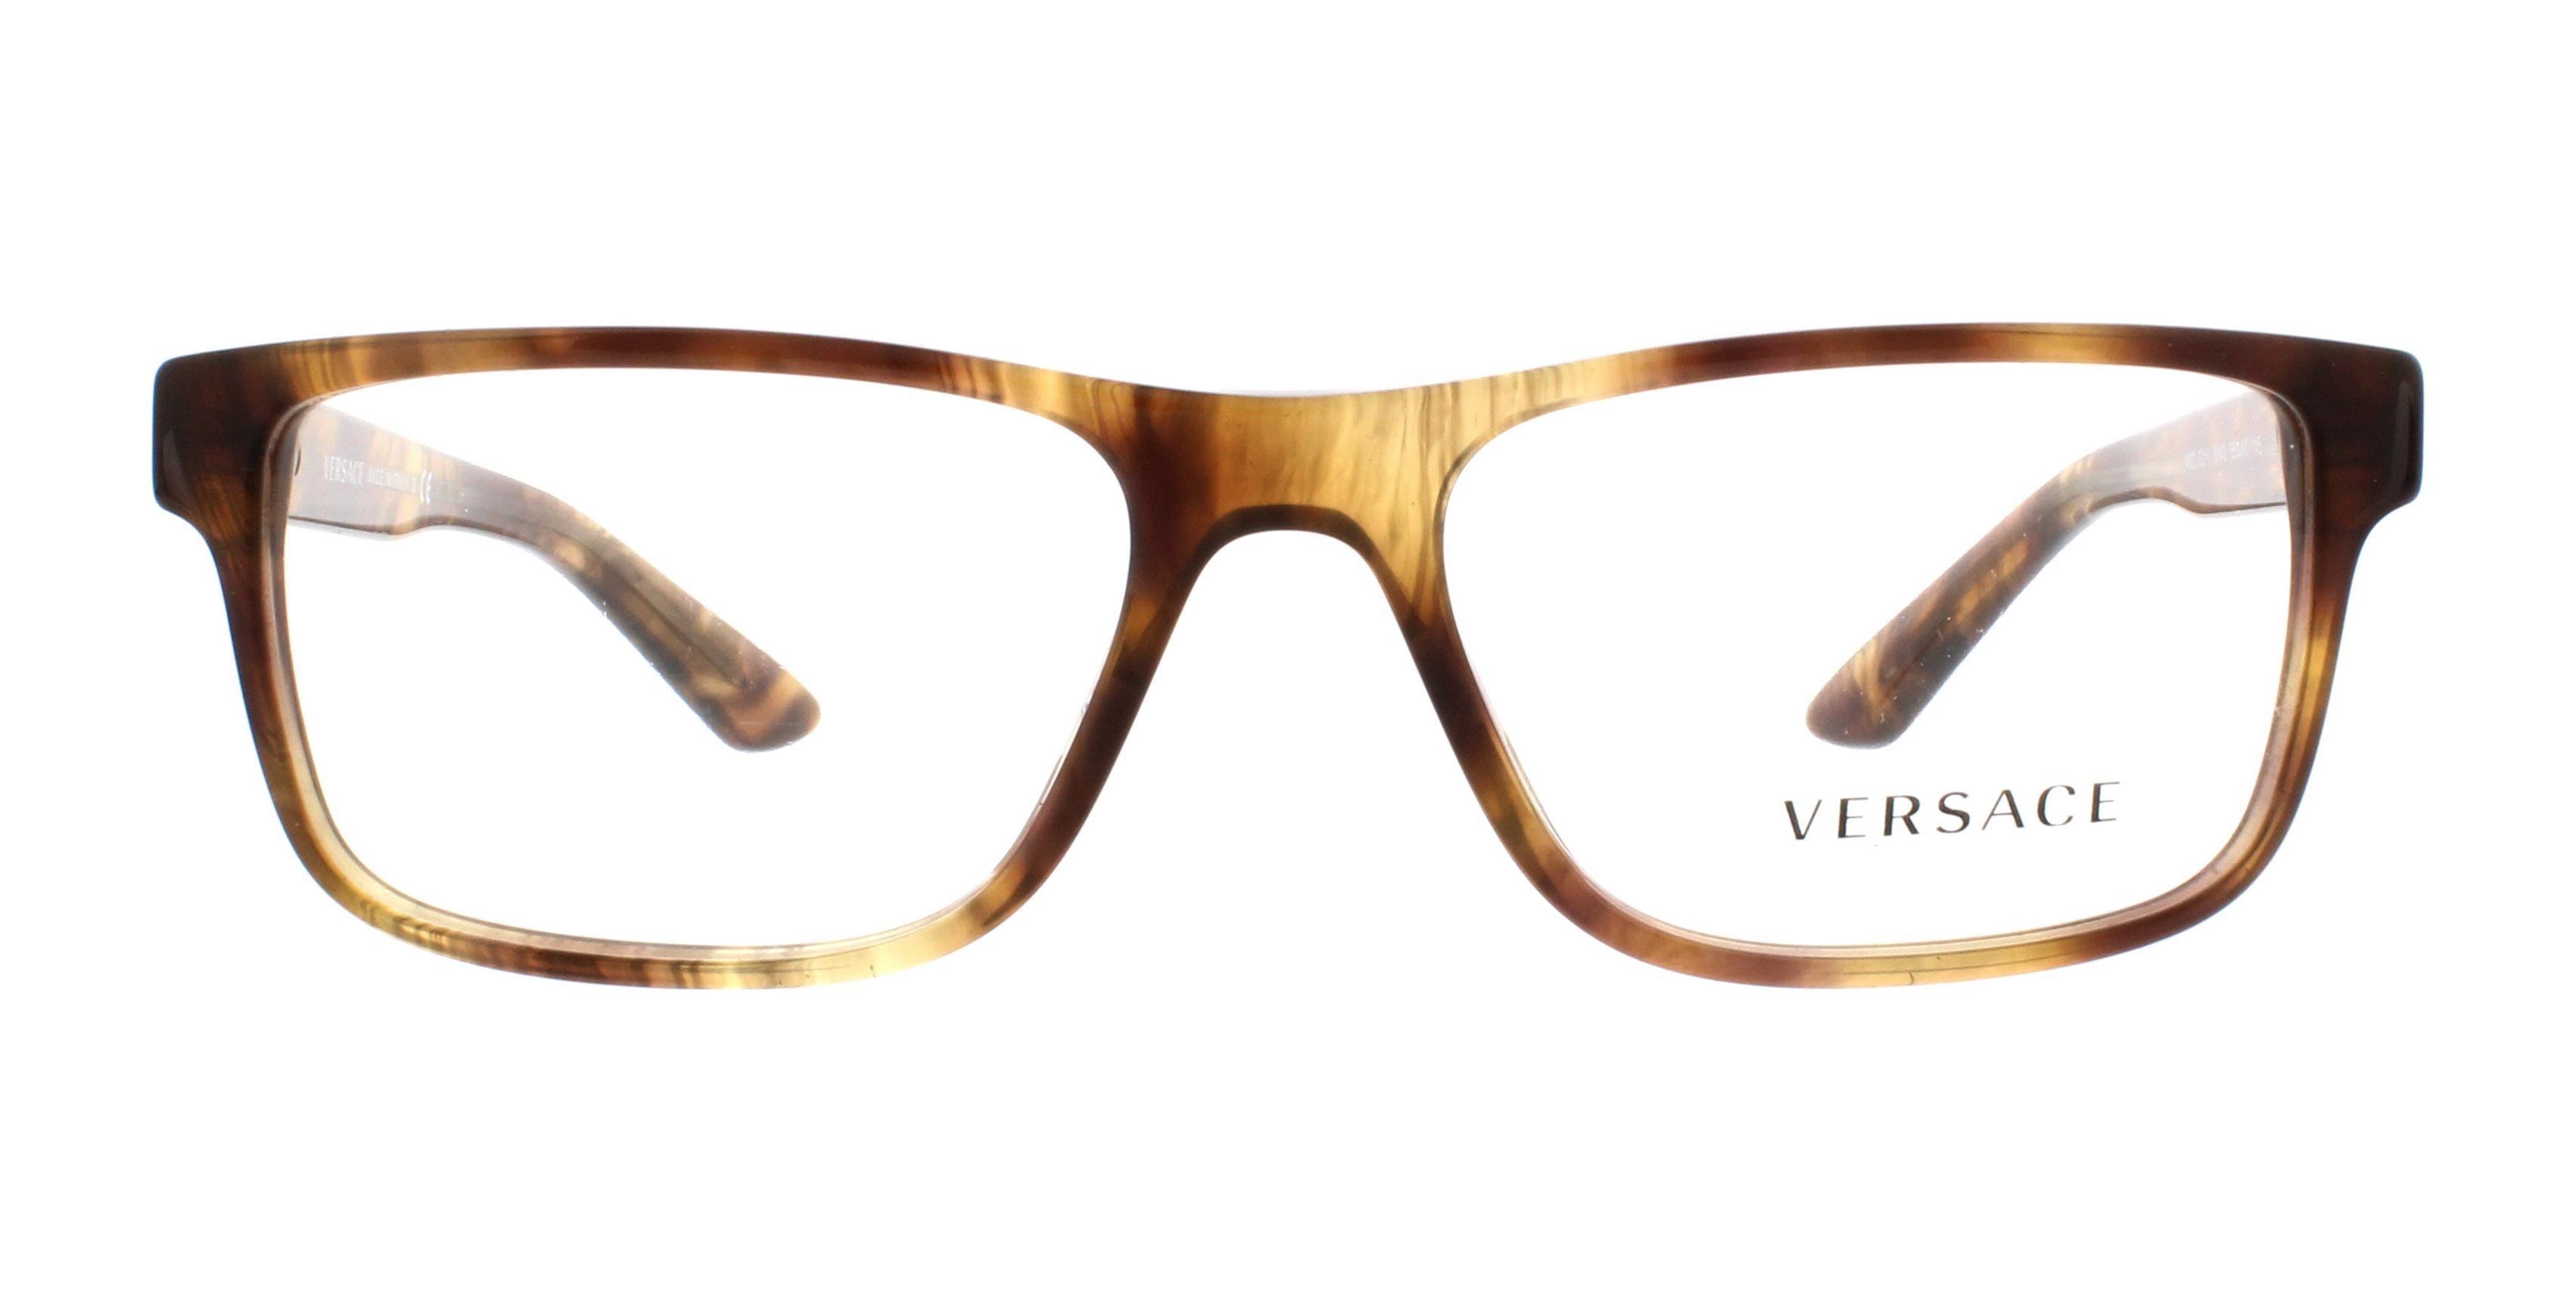 55c82a5ac3e VERSACE Eyeglasses VE3211 5143 Striped Havana 55MM - Walmart.com